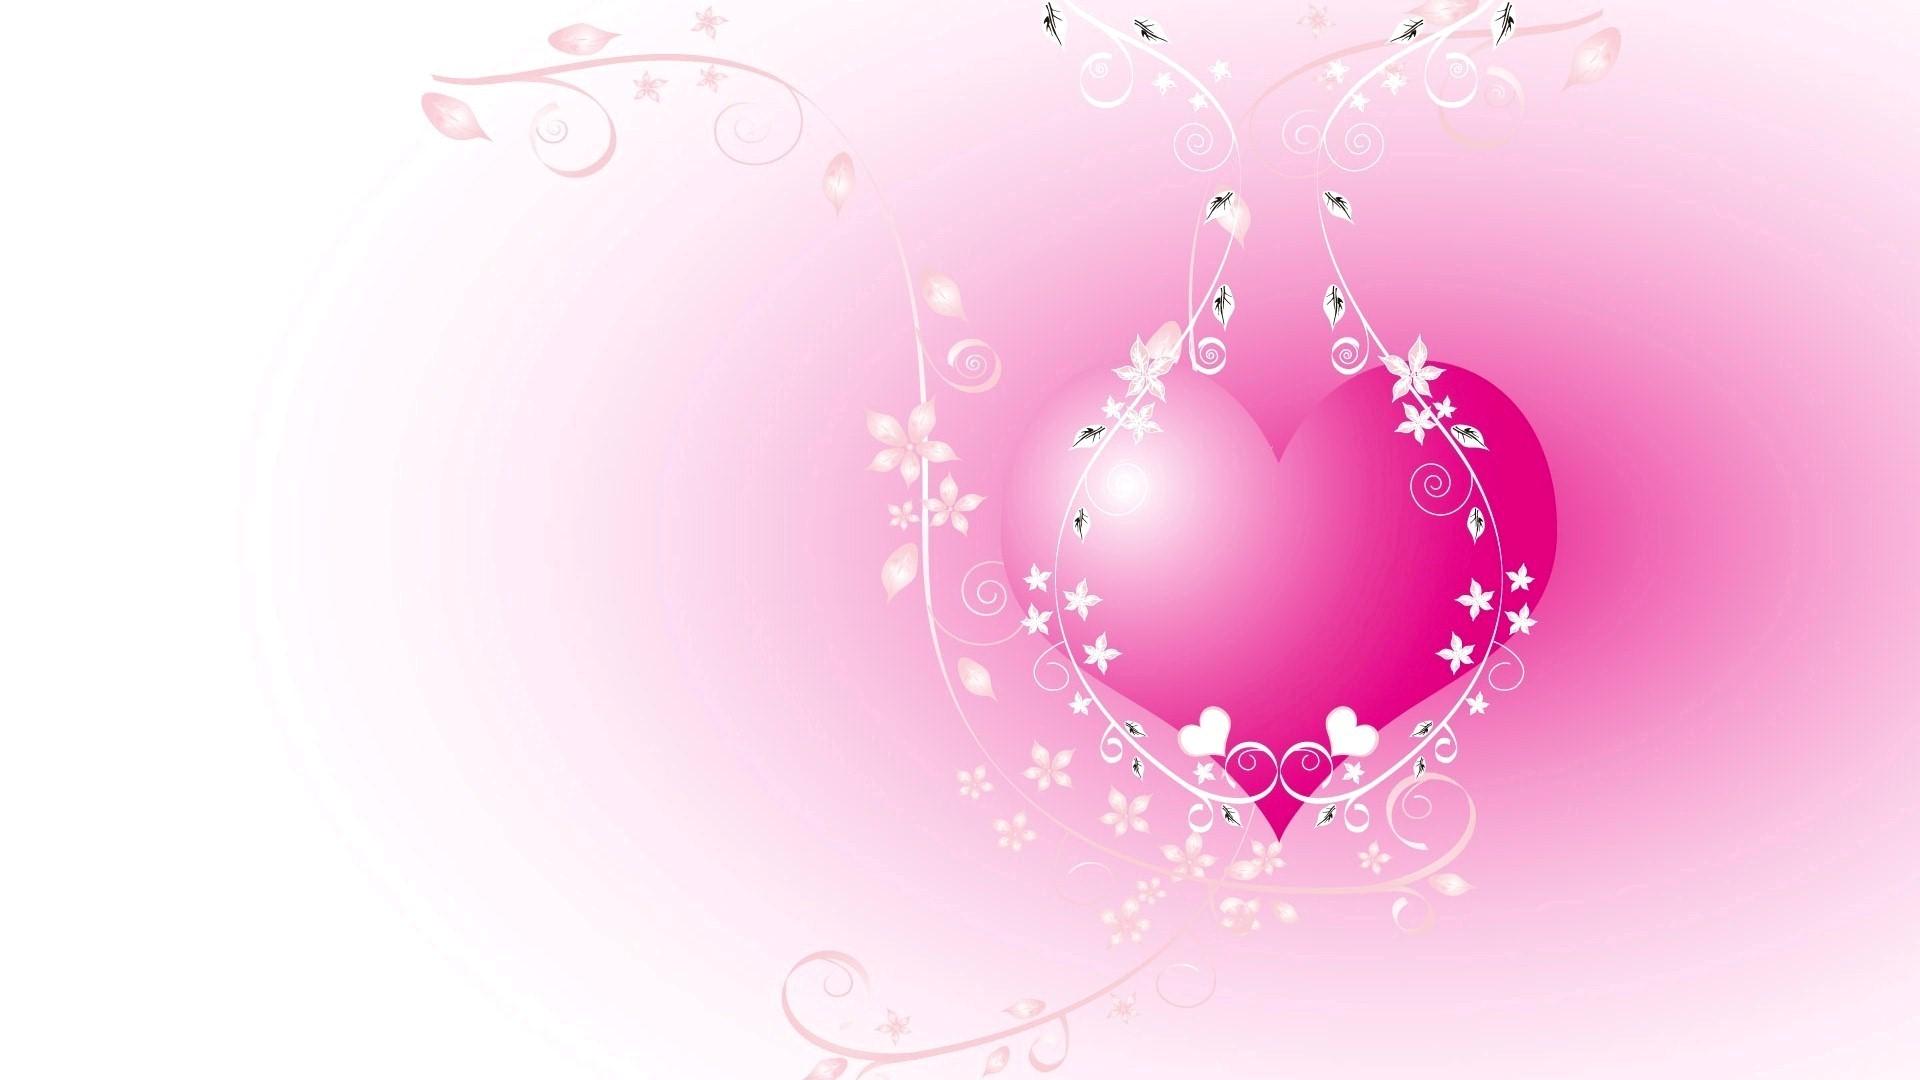 pretty heart designs wallpapers - photo #42